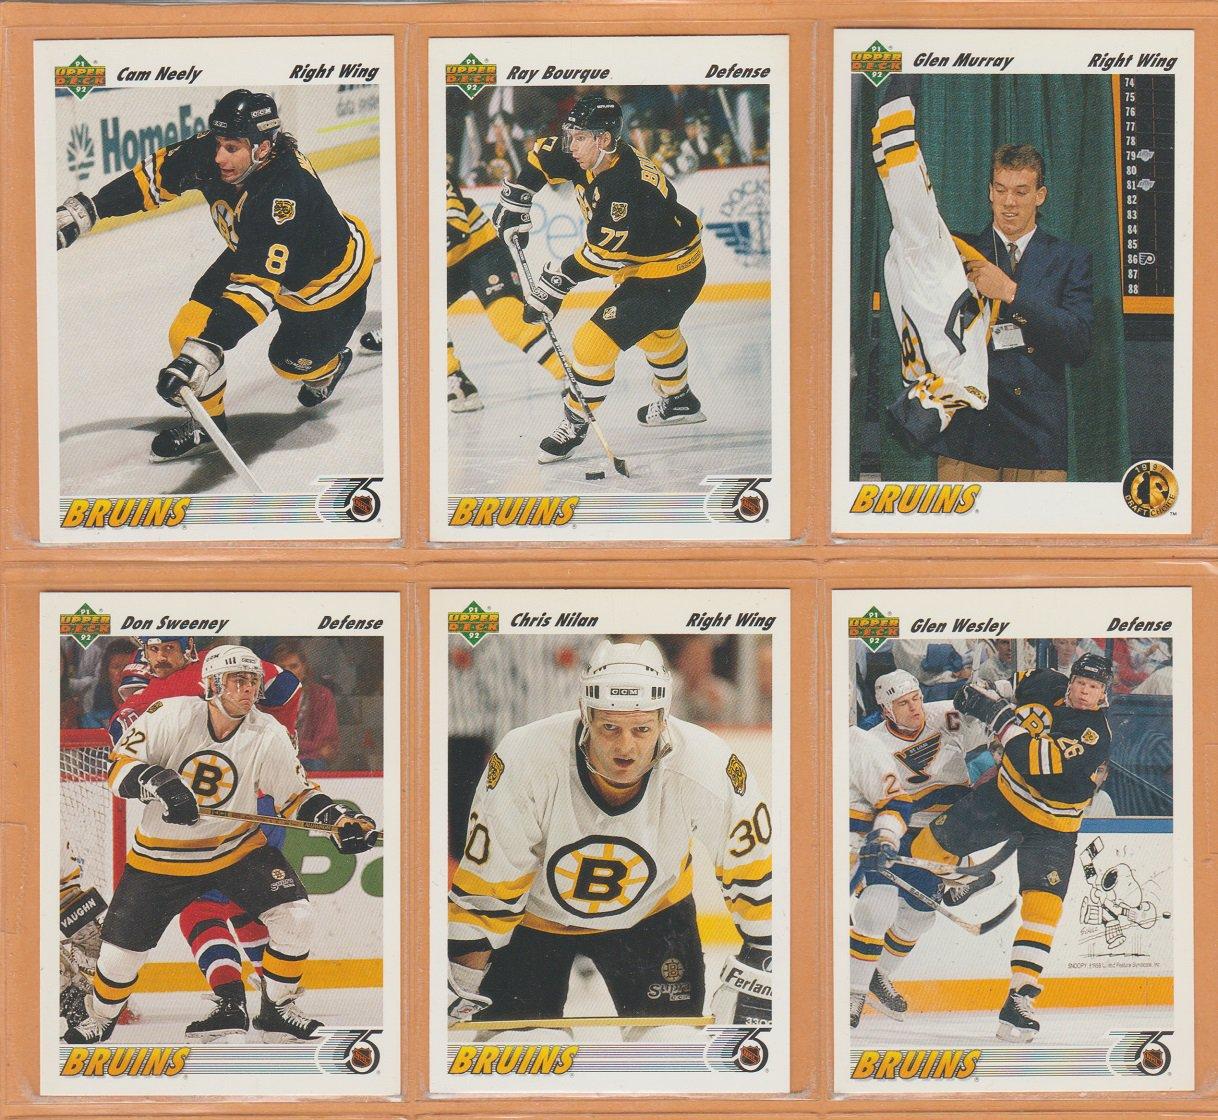 1991 Upper Deck Boston Bruins Team Set 23 Ray Bourque Cam